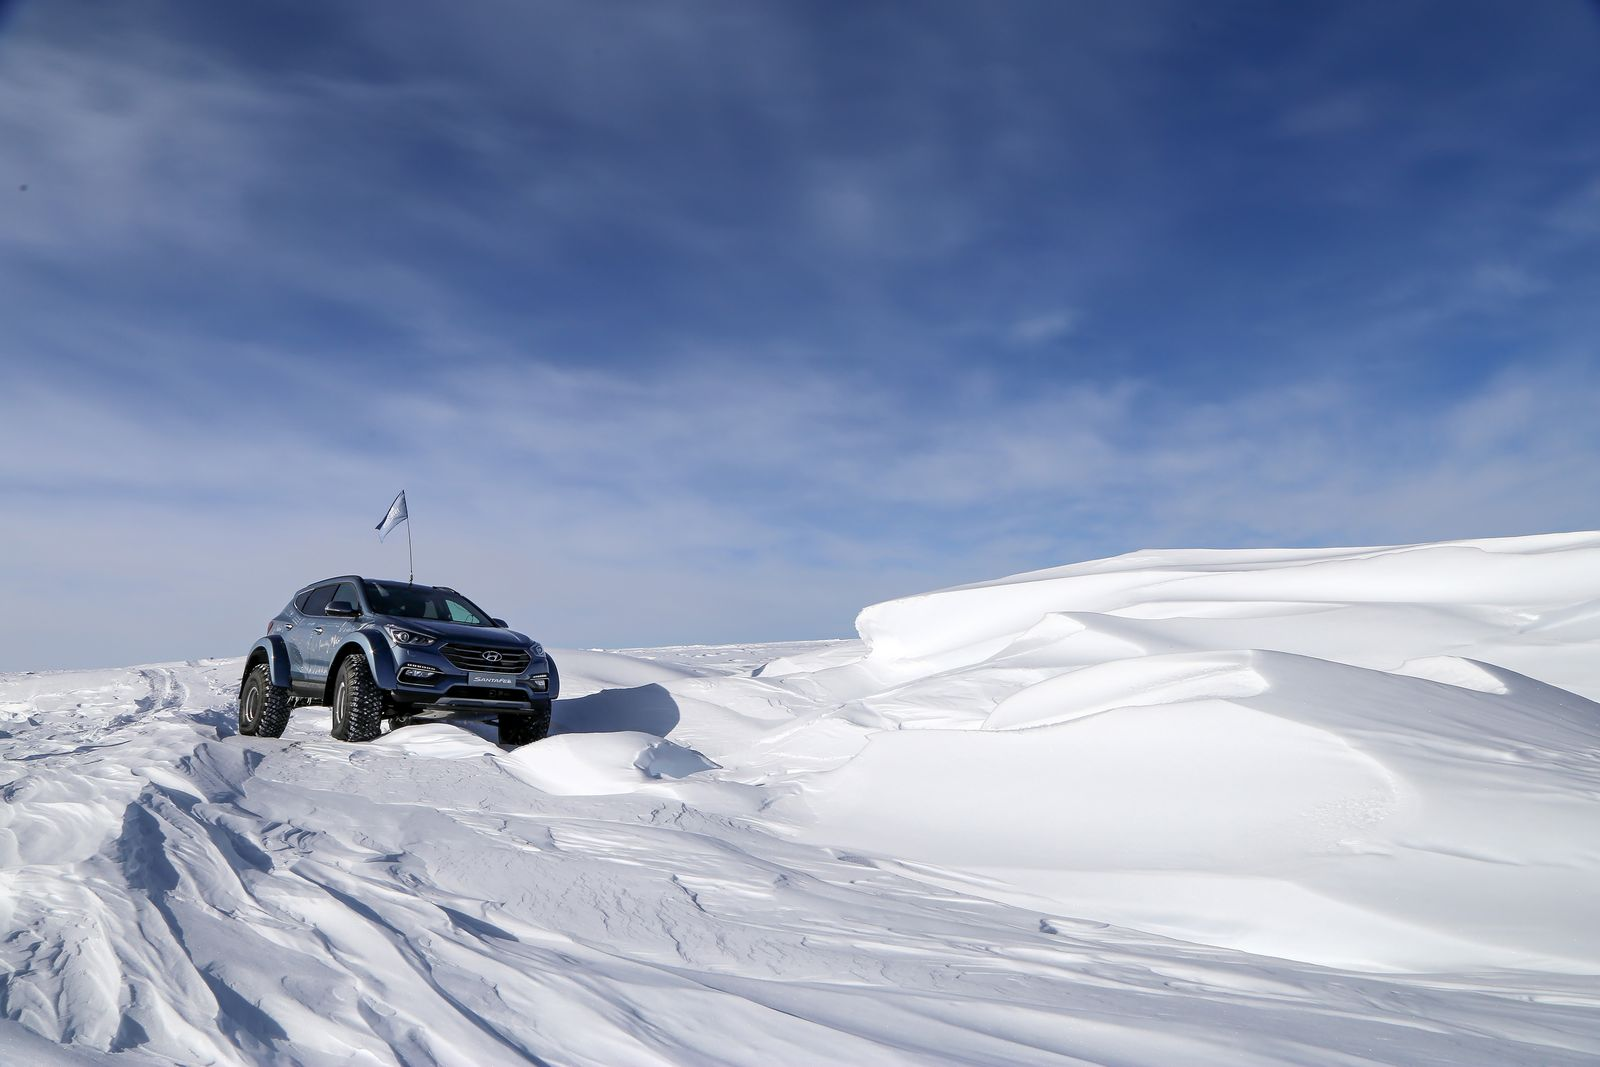 Honda Santa Fe >> Souped-Up Hyundai Santa Fe Drives Across Antarctica | Carscoops